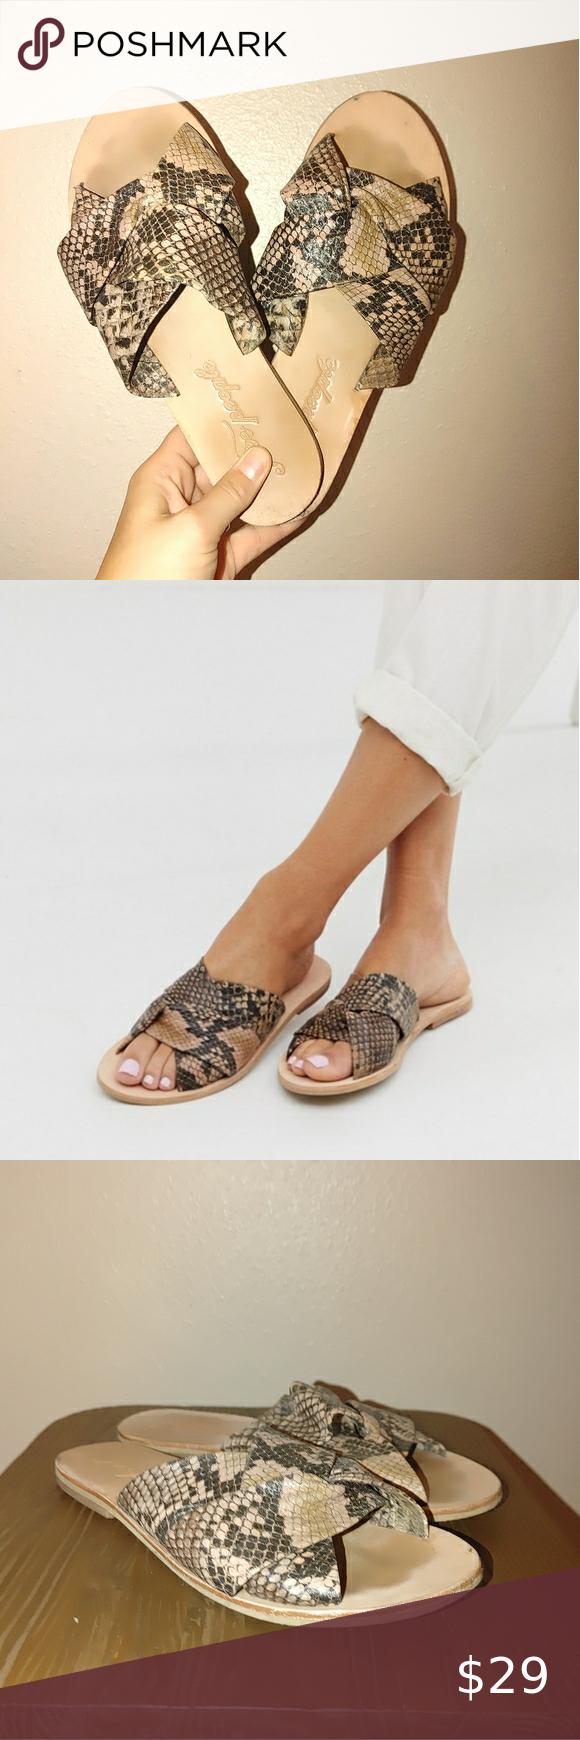 Free People Rio Vista Leather Snake Slide Sandal Slide Sandals Open Toe Flats Flat Shoes Women